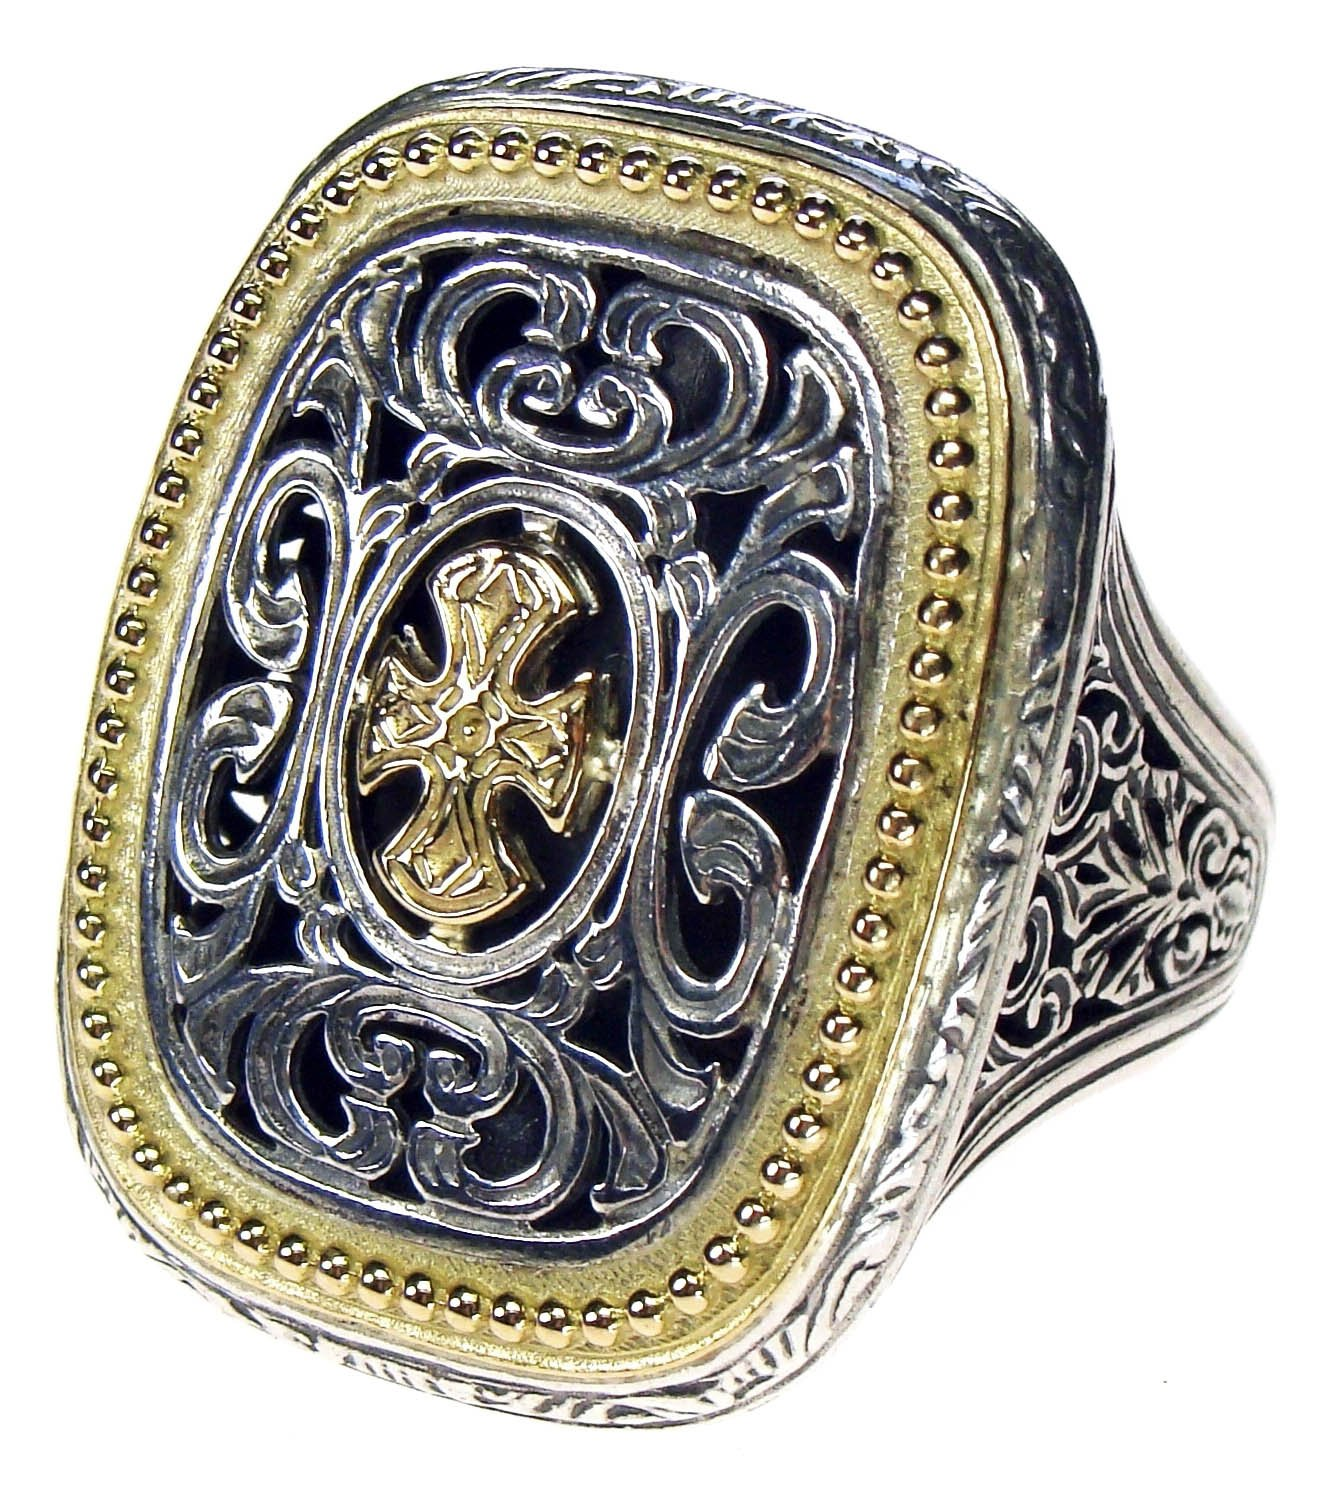 Gerochristo 2625- Maltese Cross- Solid 18K Gold & Silver Medieval Ring / size 7